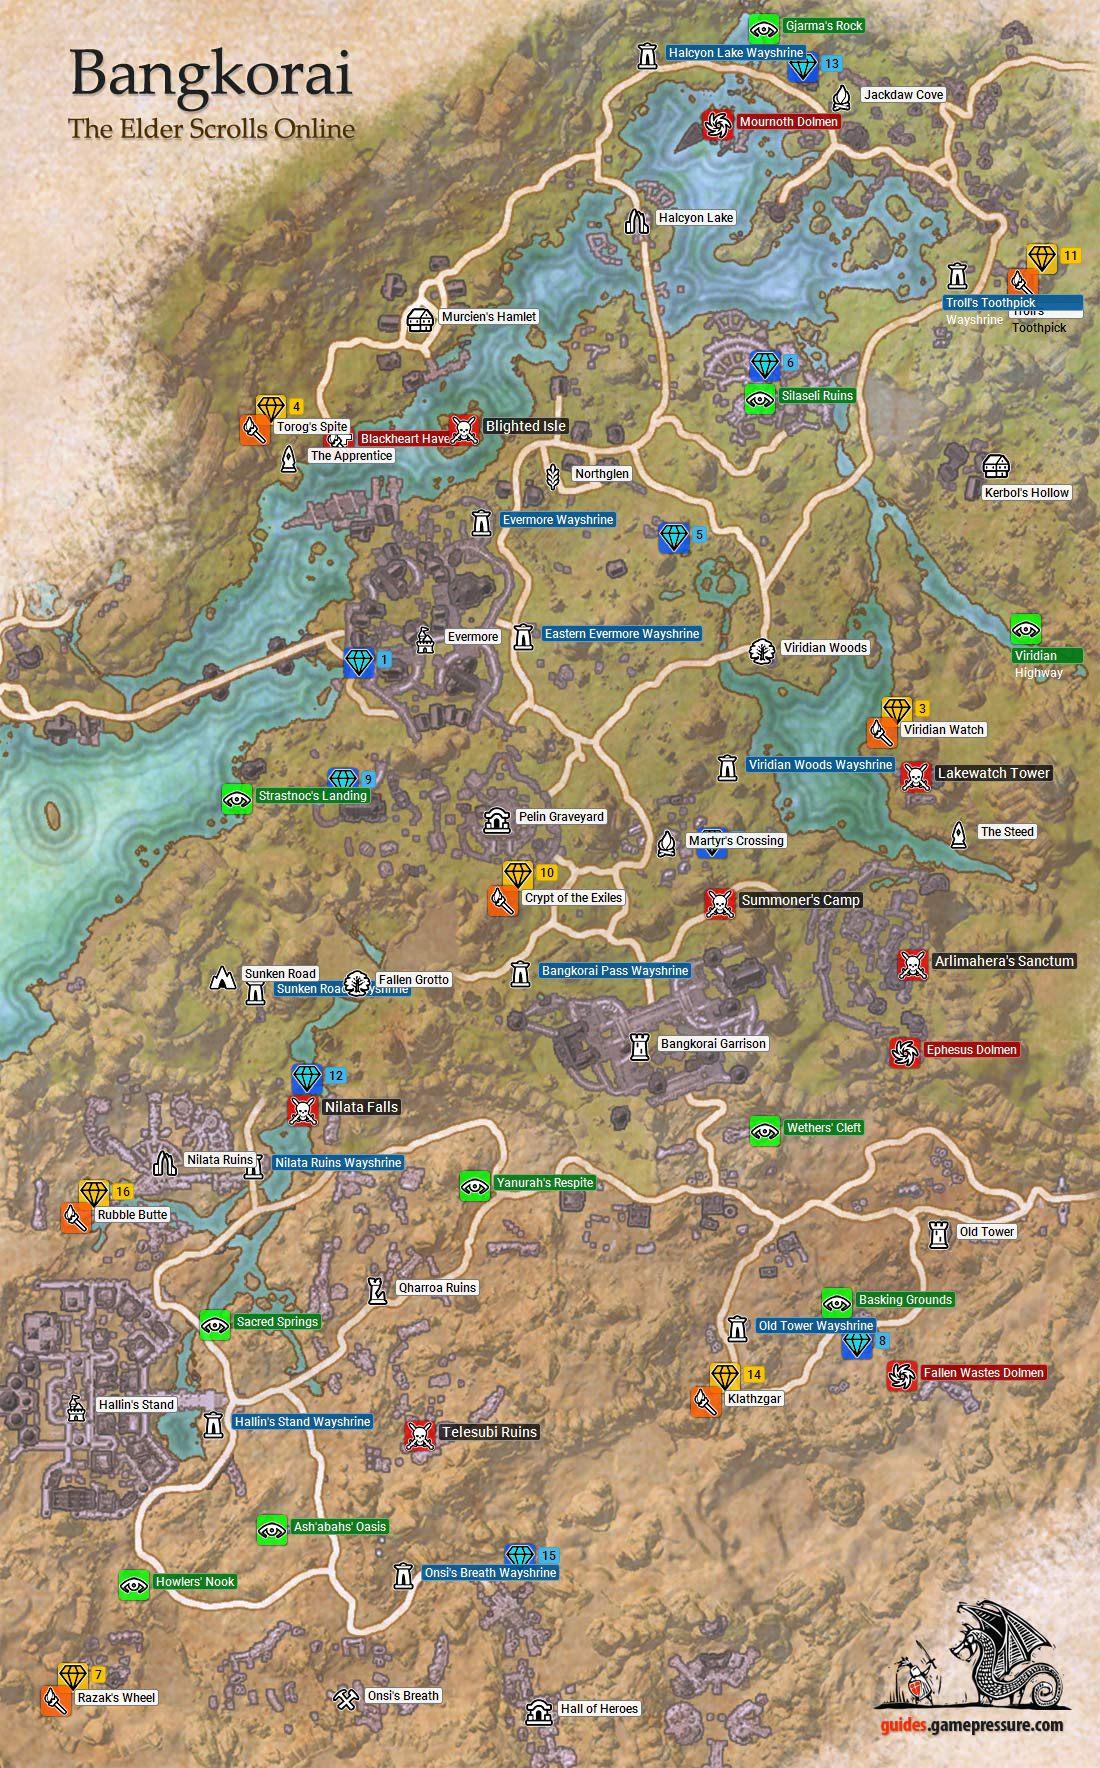 Reaper's March Map : reaper's, march, Bangkorai, Daggerfall, Covenant, Elder, Scrolls, Online, Guide, Gamepressure.com